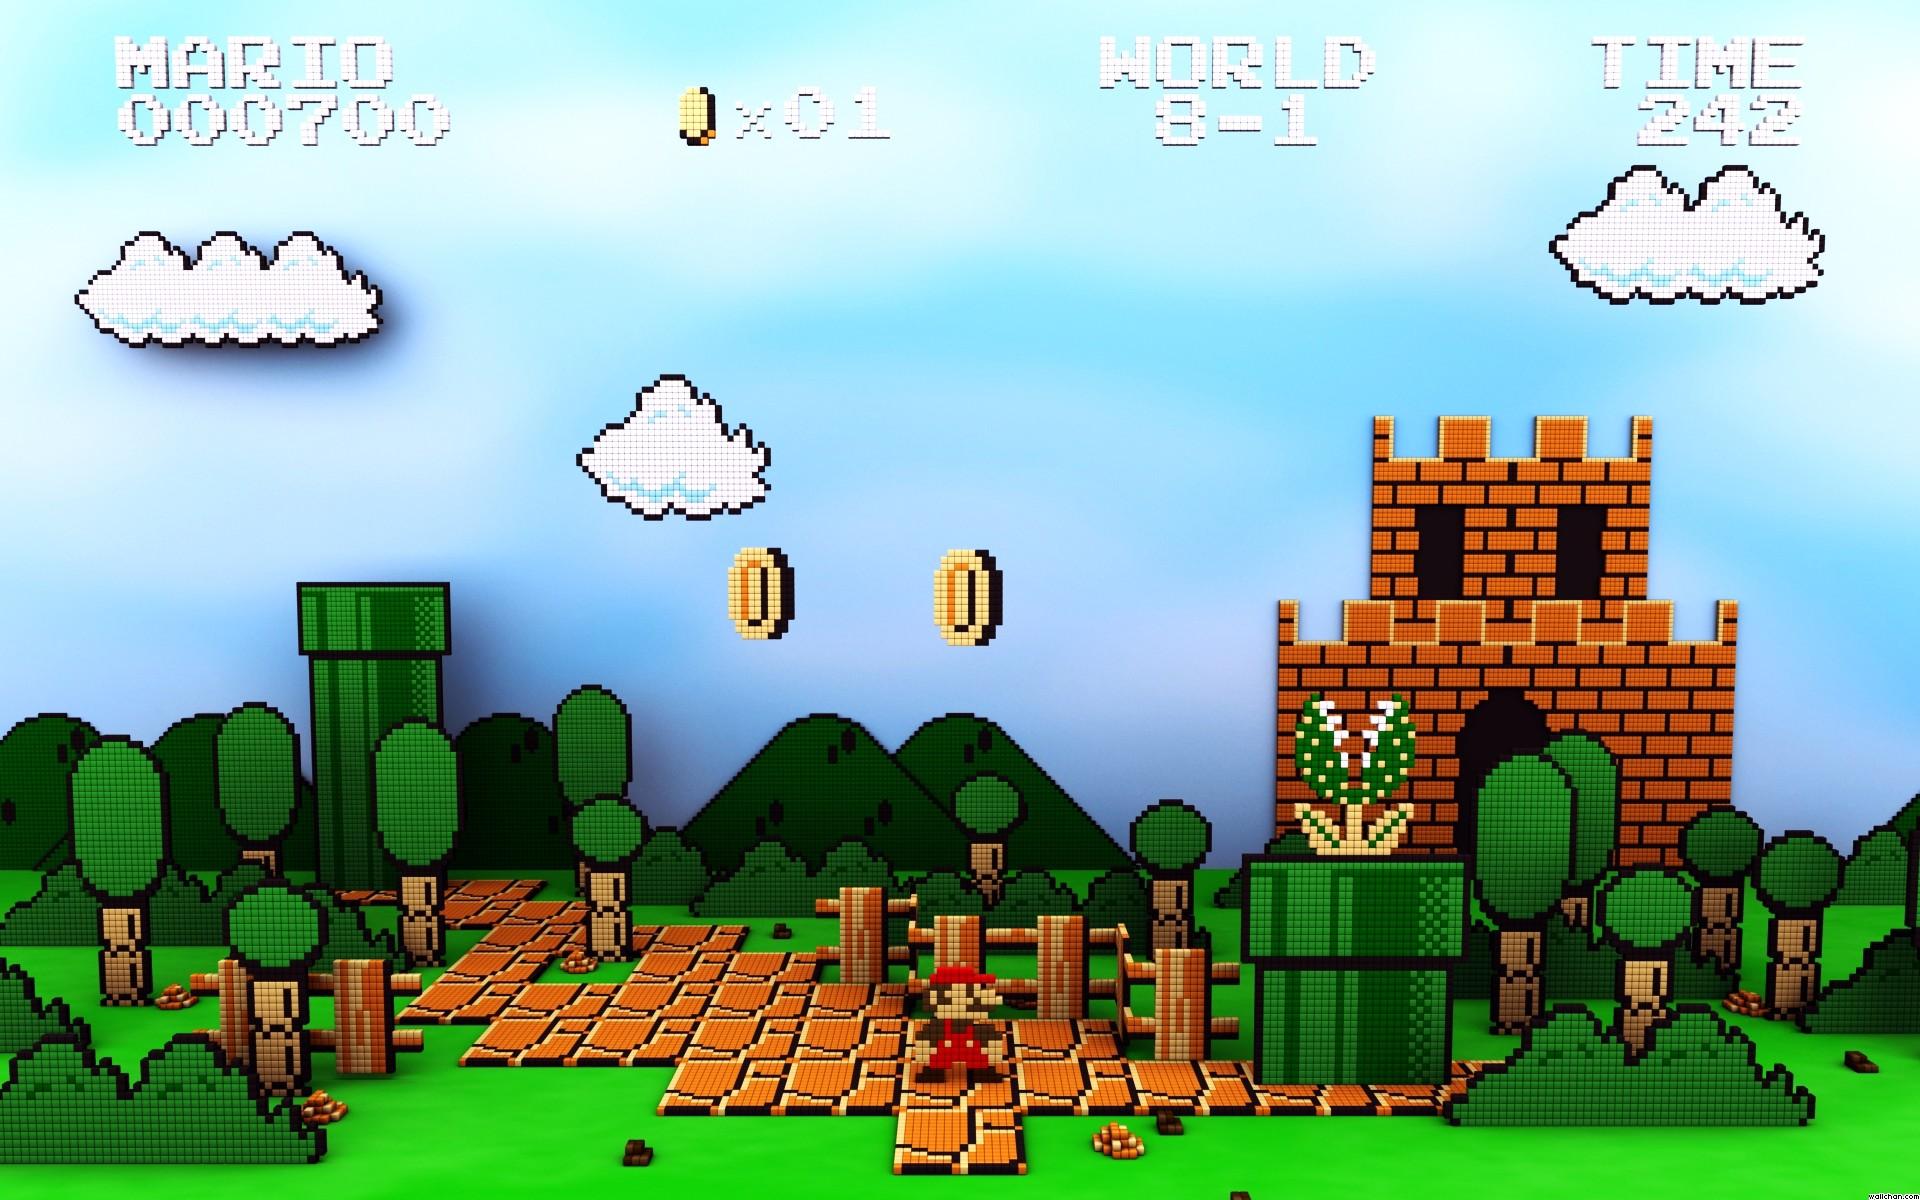 Super Mario Bros Live Wallpaper. Mario Brothers WallpapersHD Wallpapers